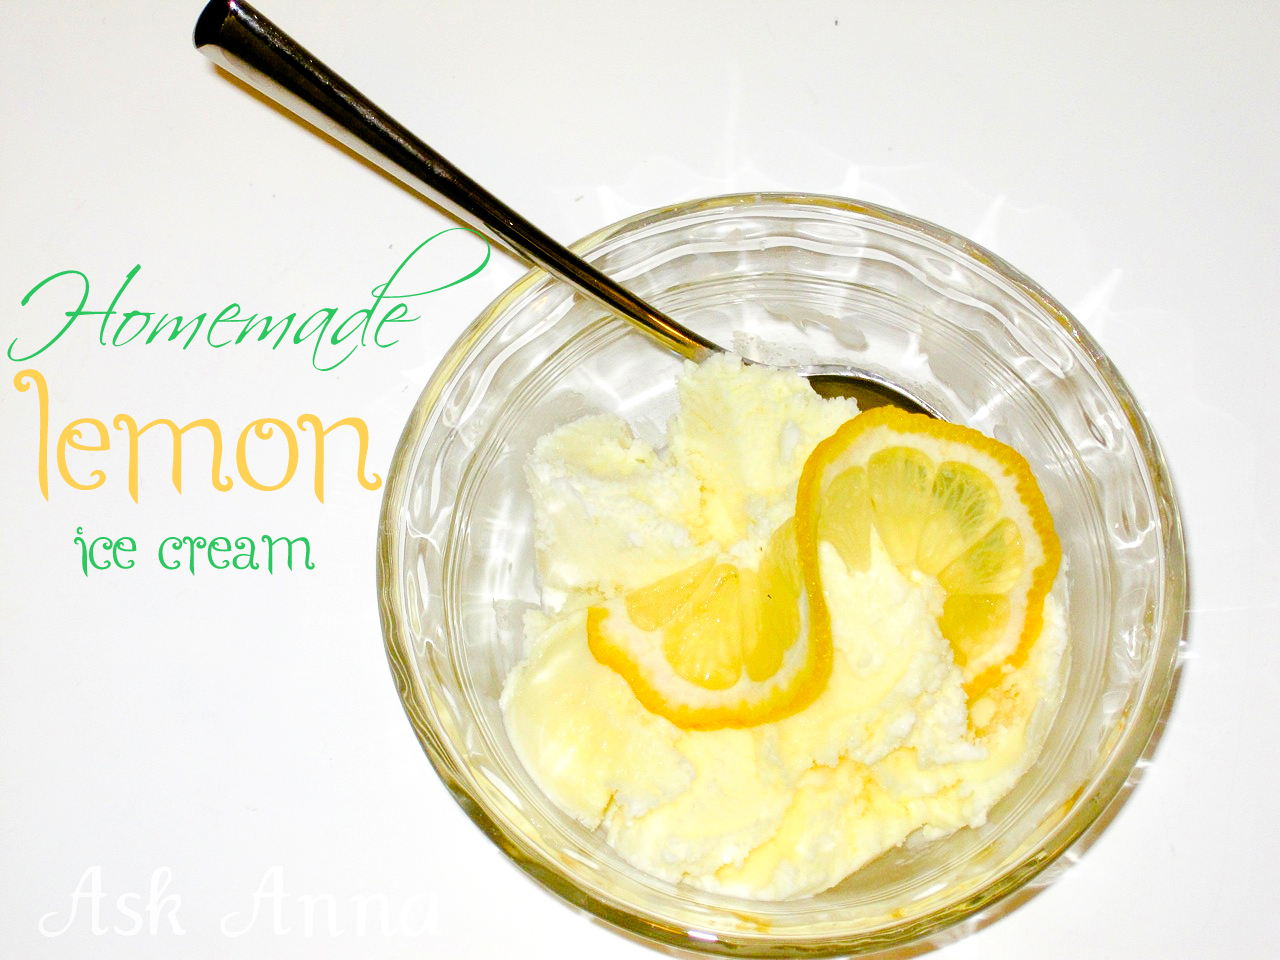 Homemade lemon ice cream - Ask Anna